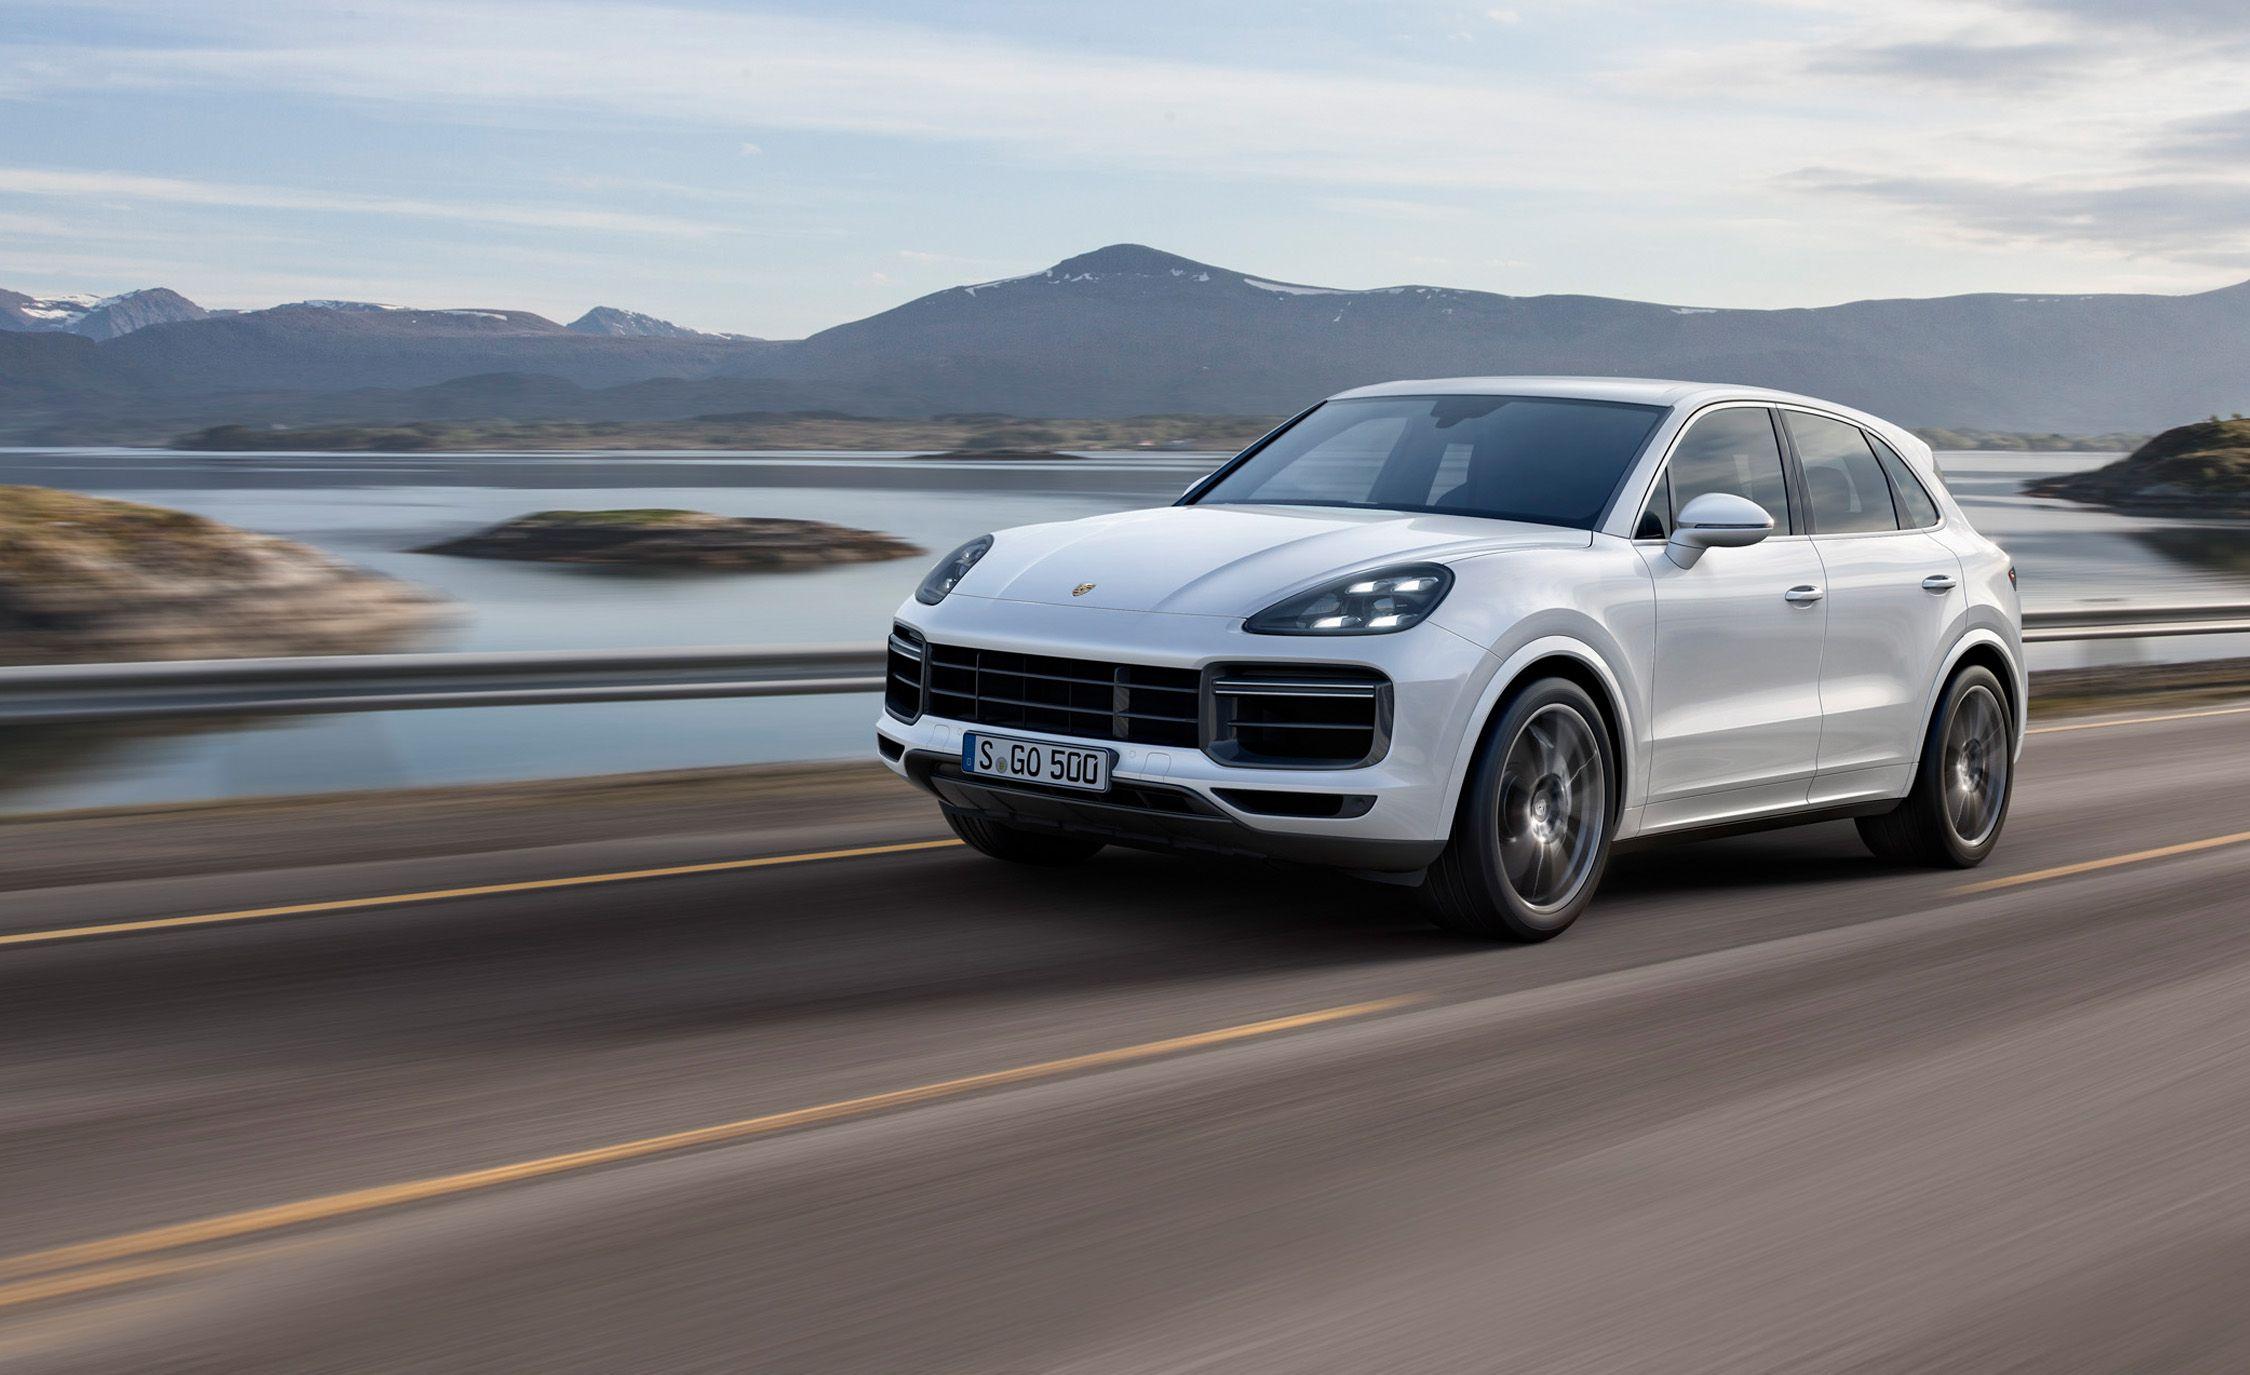 2019 Porsche Cayenne Turbo: A Tall Glass of Speedy Utility